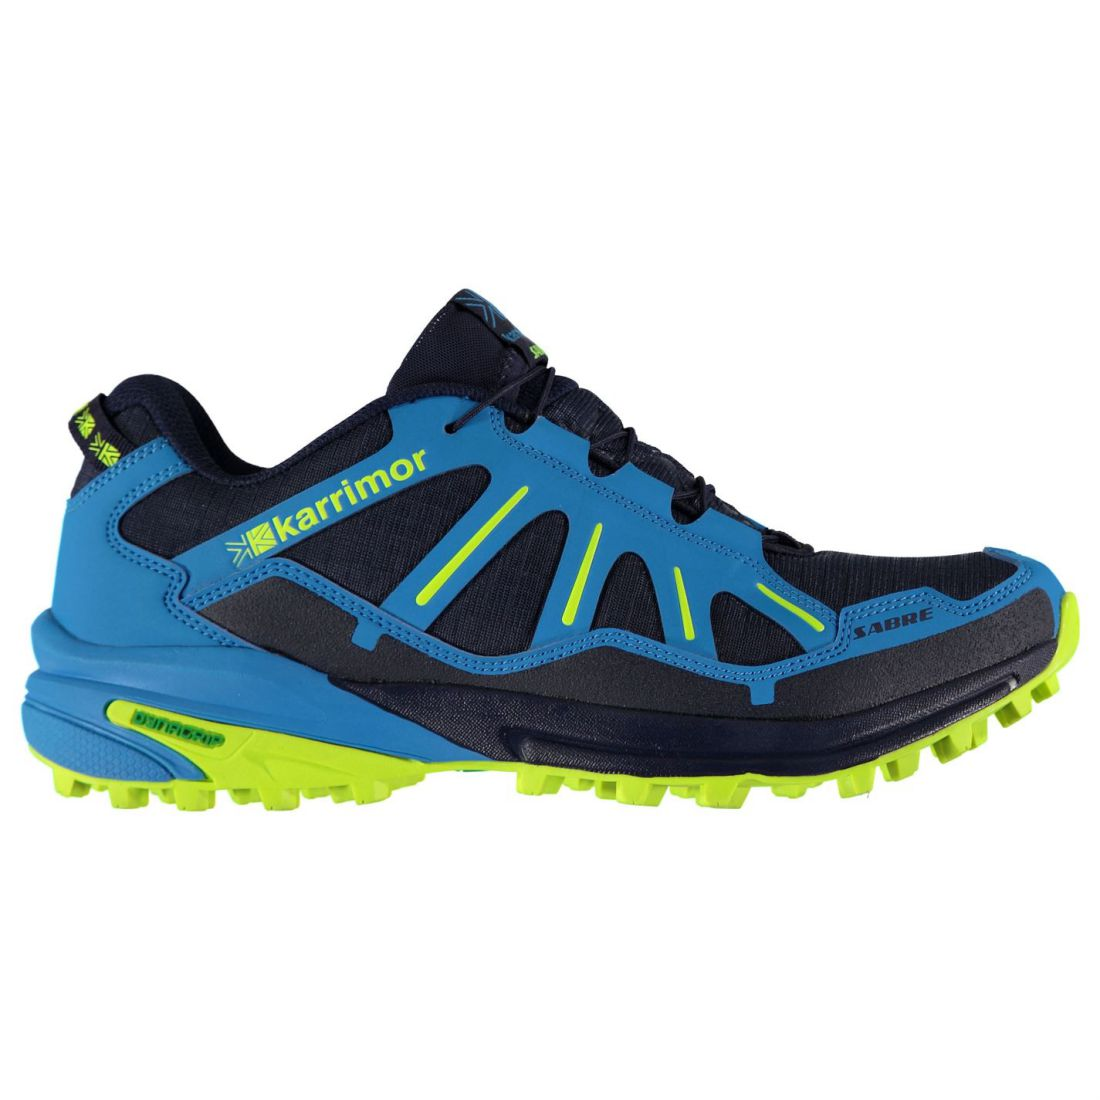 e788fa4e1e40c Karrimor Mens Sabre Trail Running Shoes Textile Padded Ankle Collar Quick  Lacing